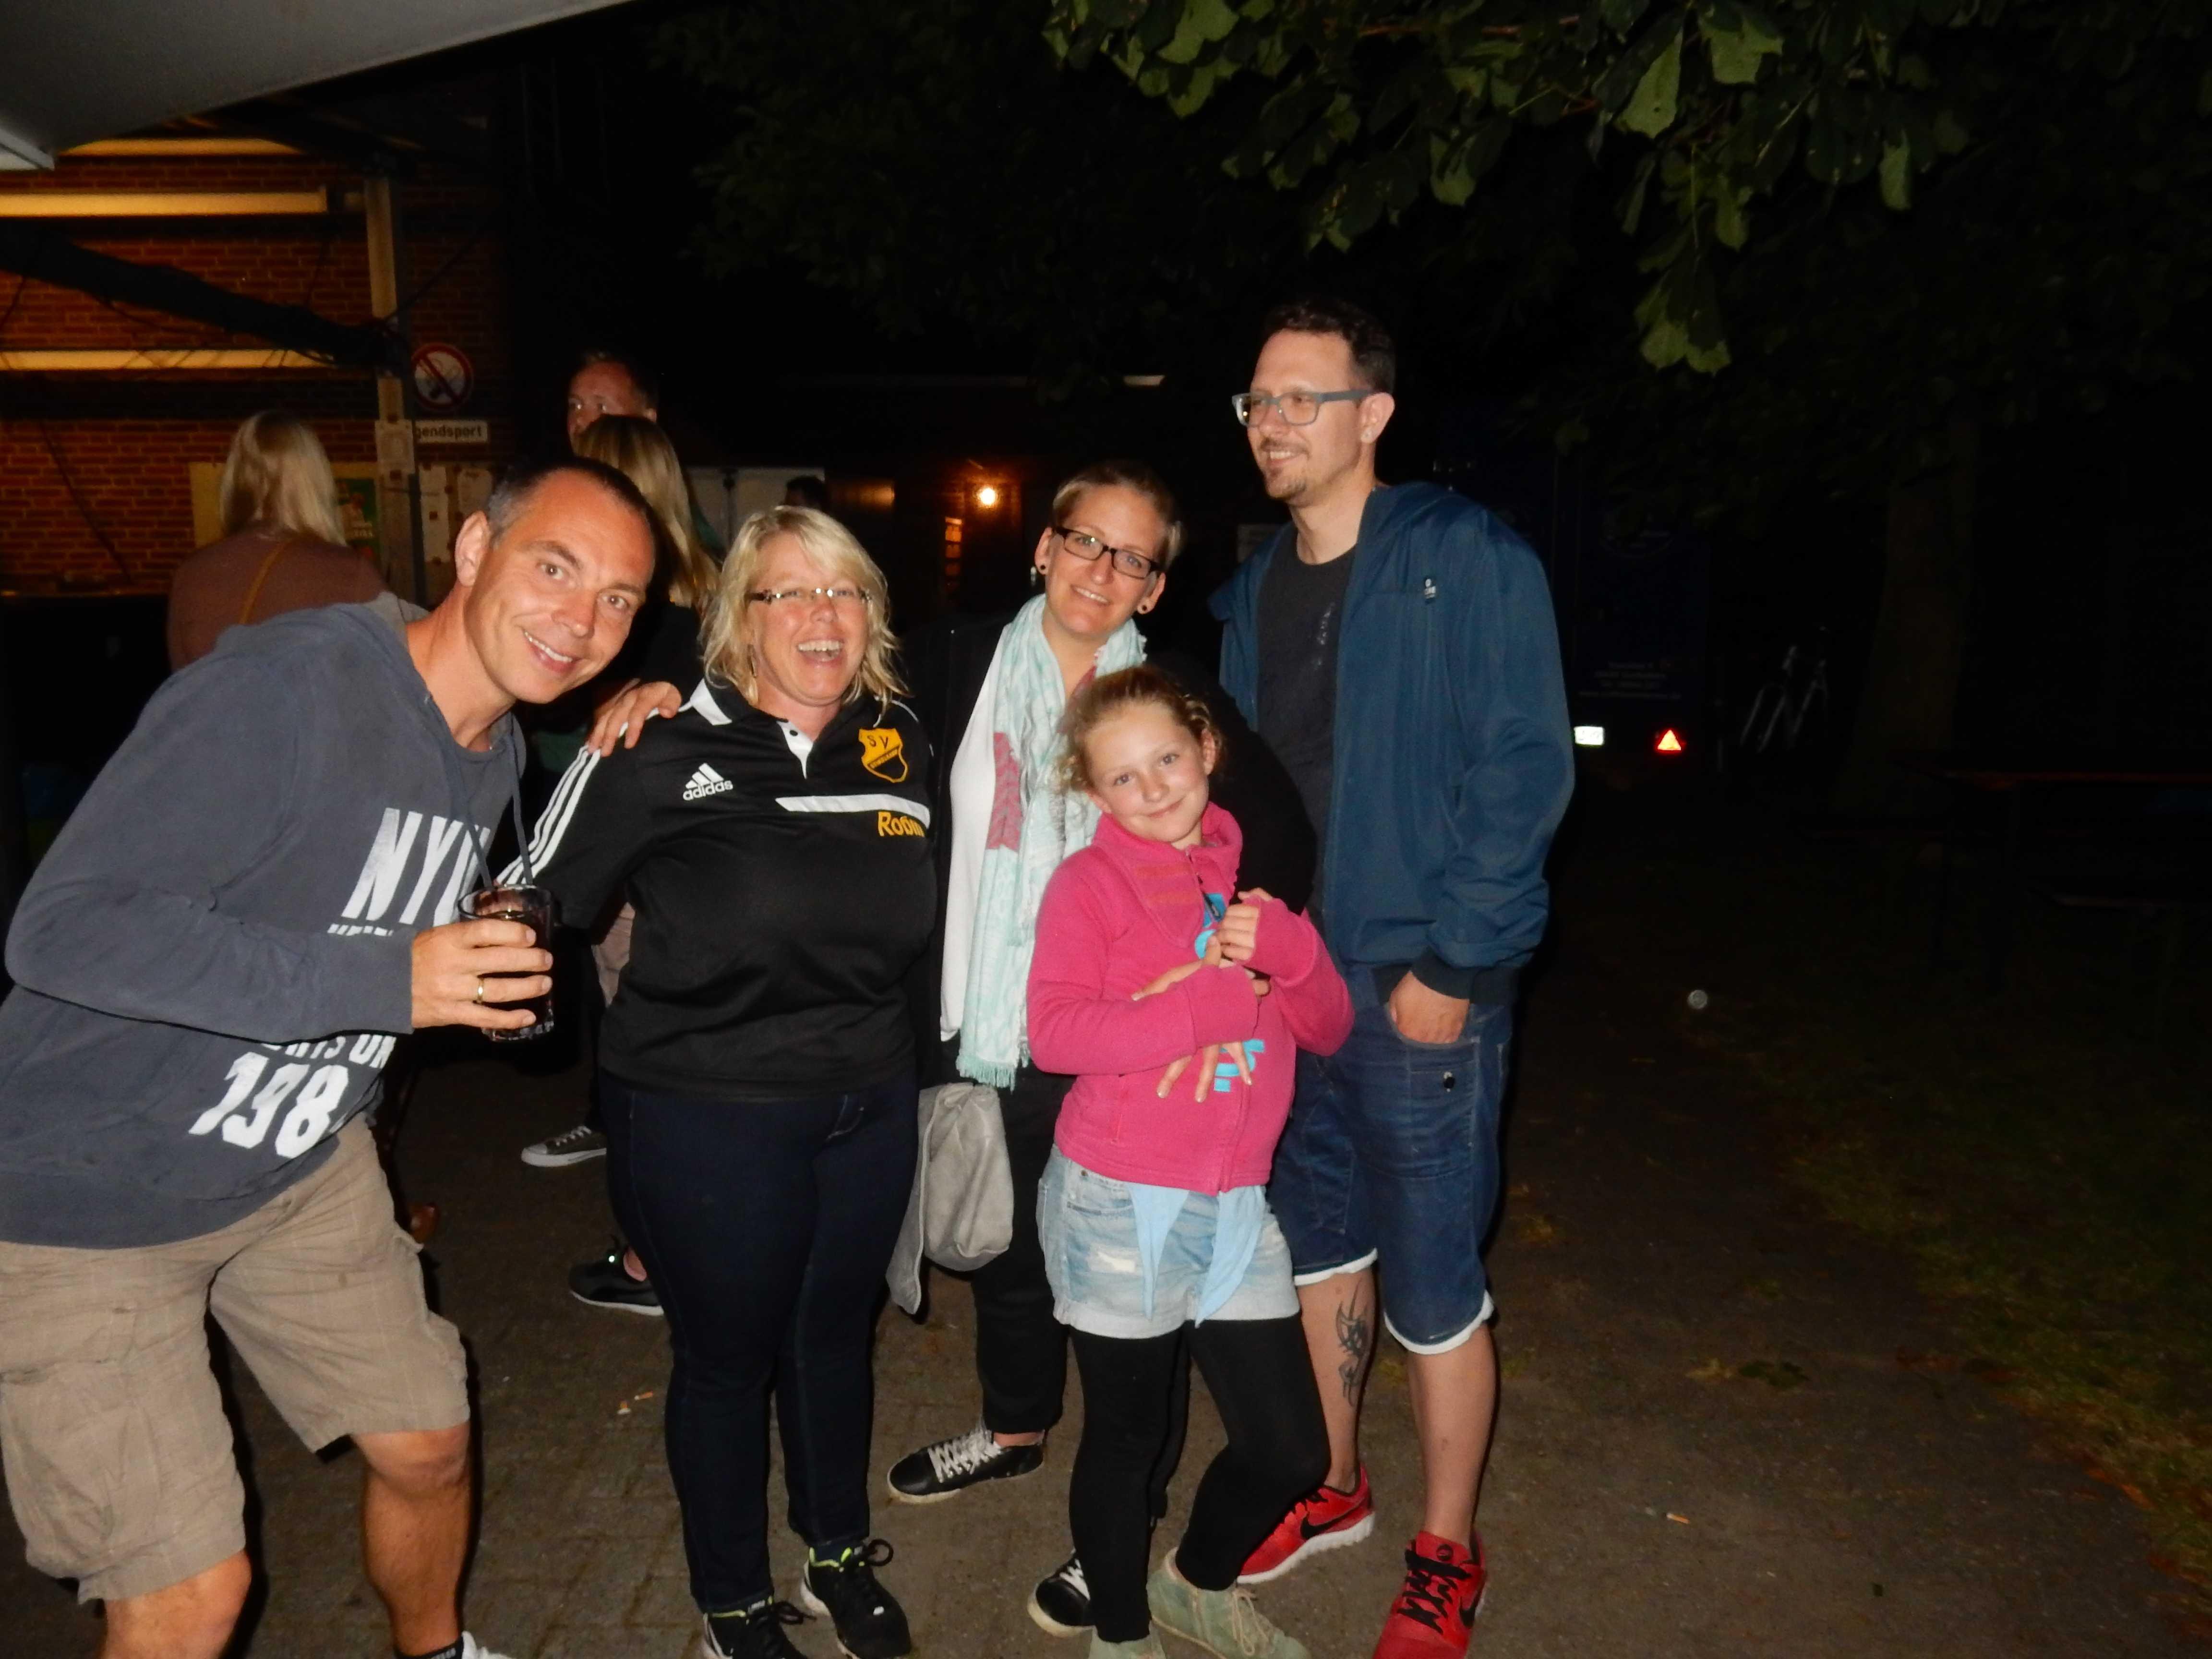 2016-07-28 Sportwoche - erster Donnerstag (59)